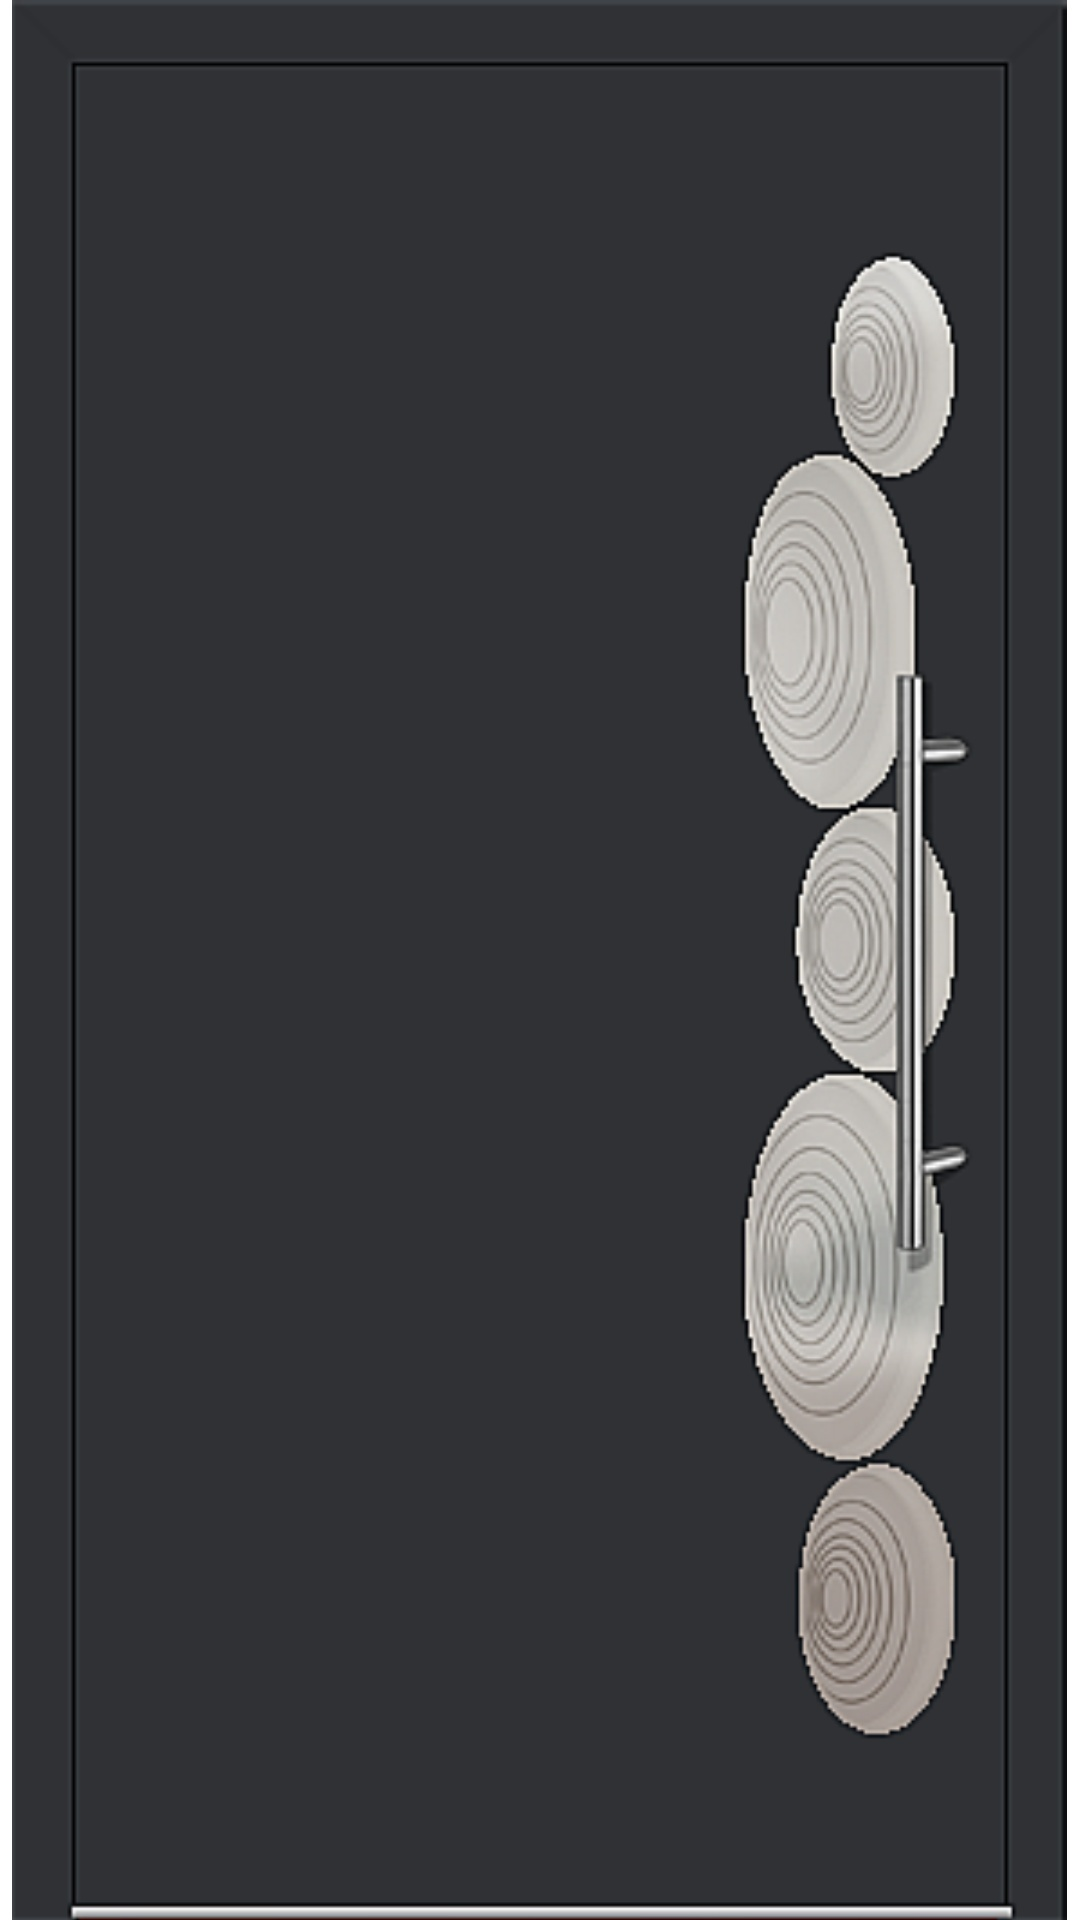 Aluminium Haustür Modell 6153-40 schwarz